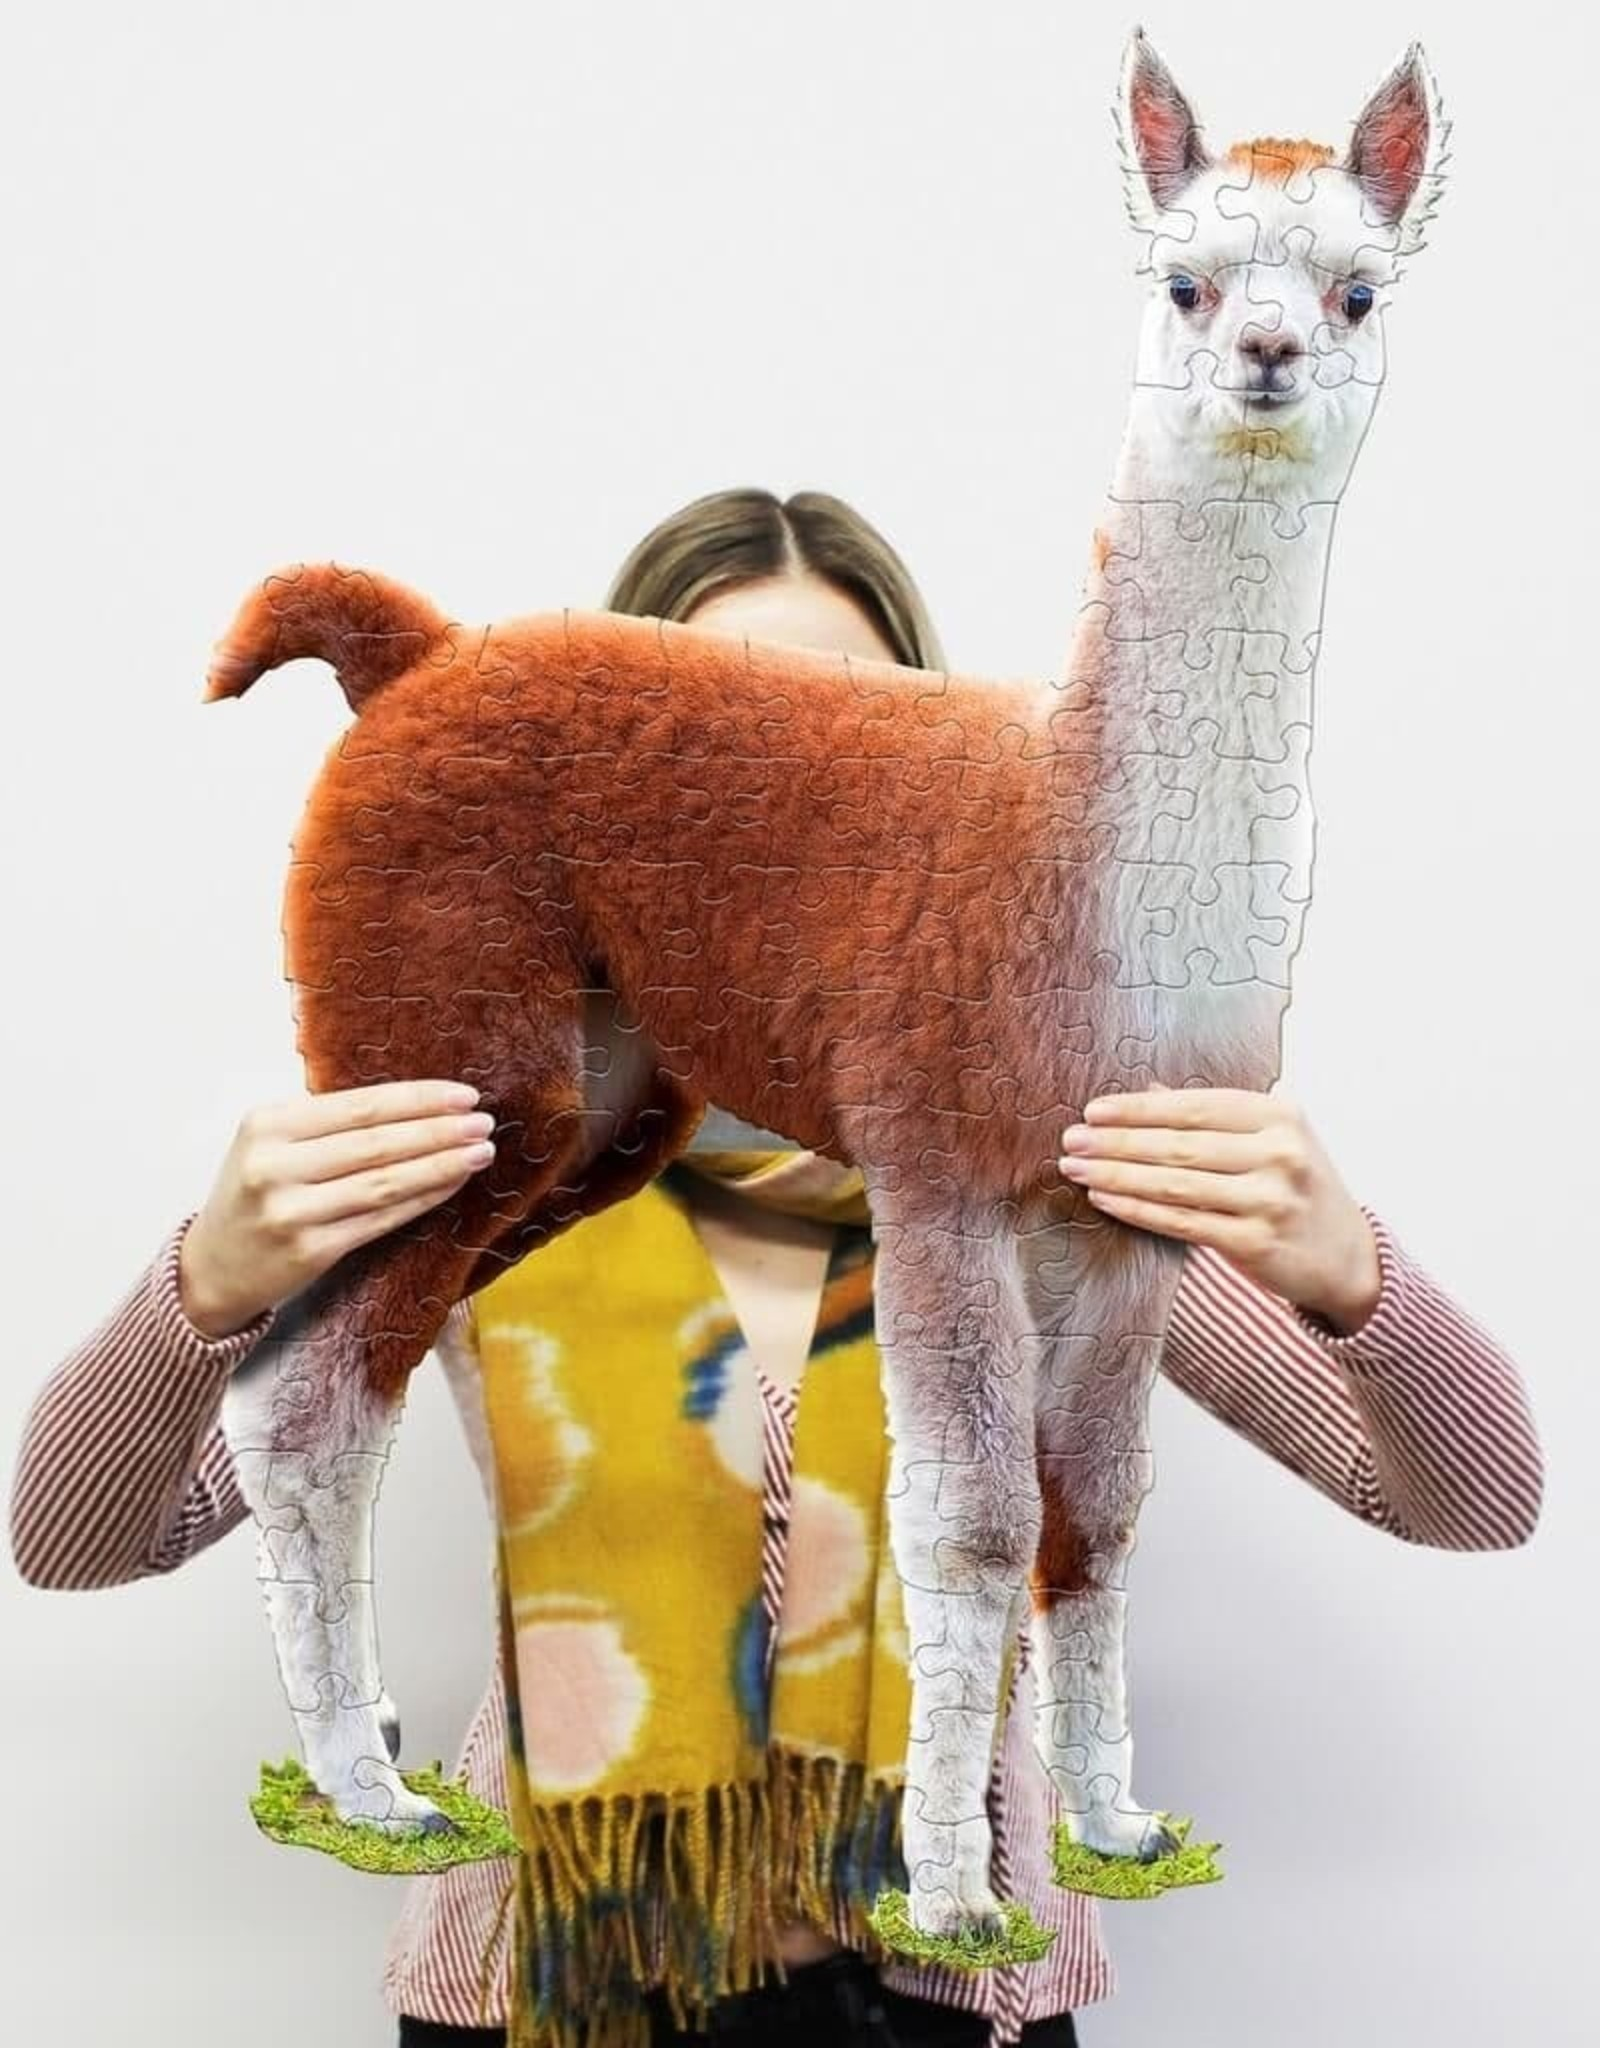 madd capp puzzles I am LiL' Llama puzzel 100 stukjes